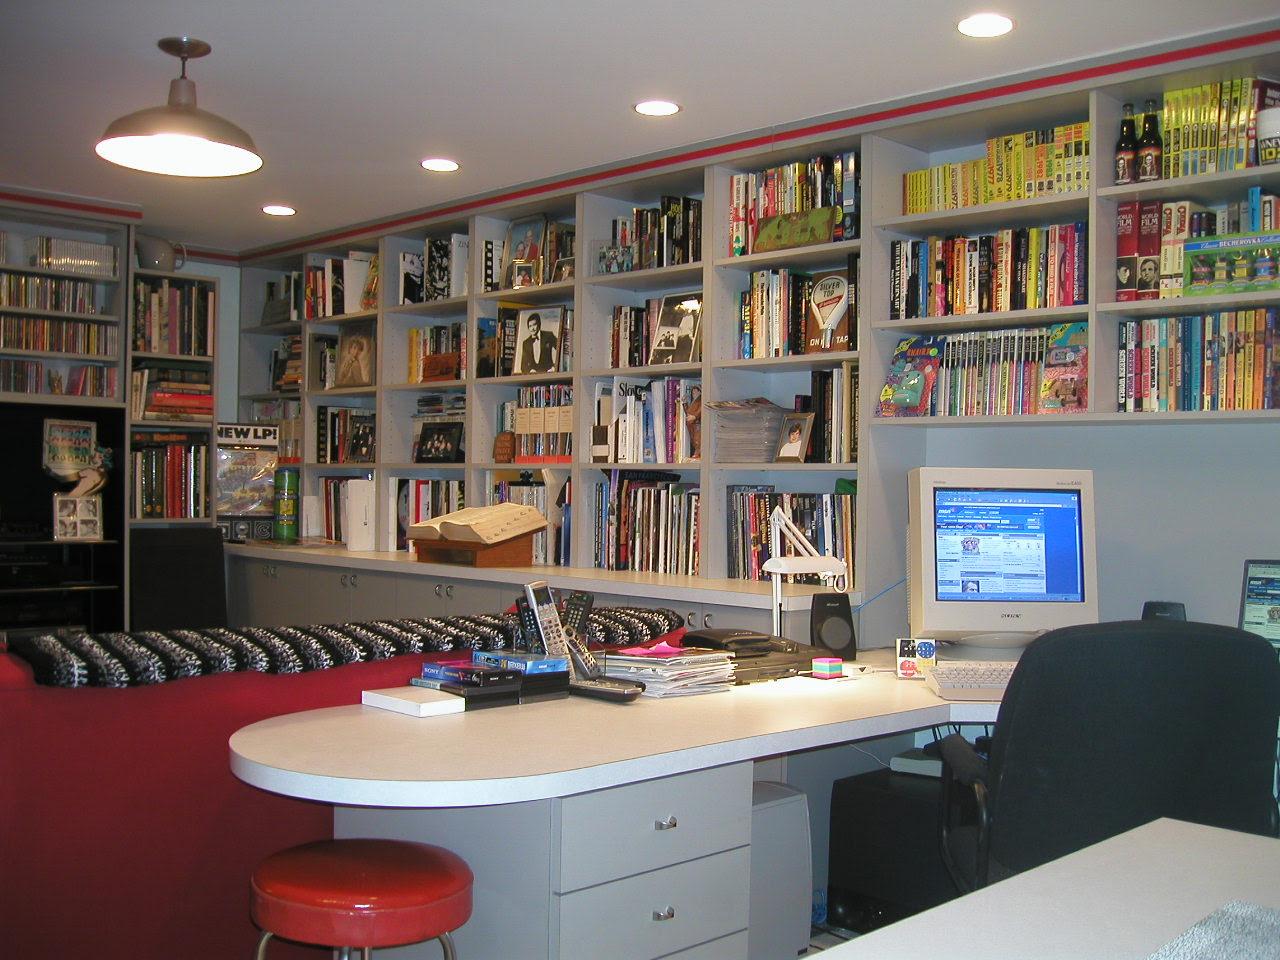 Amazing Basement Home Office Design Ideas 1280 x 960 · 254 kB · jpeg